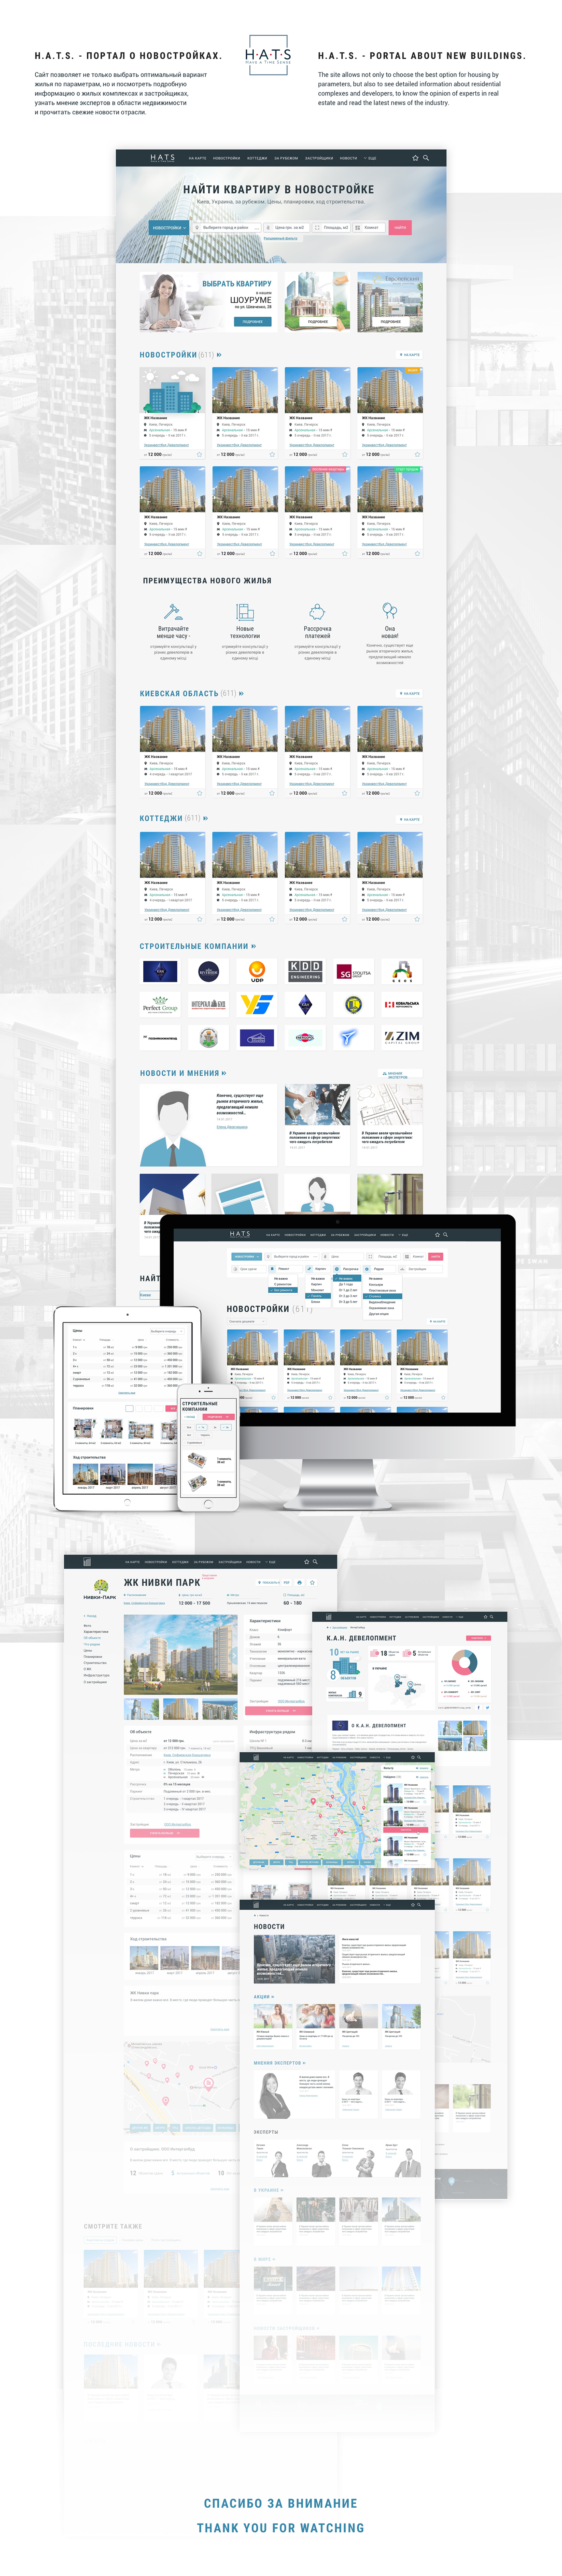 page Hats development build house news experts real estate portal Catalogue